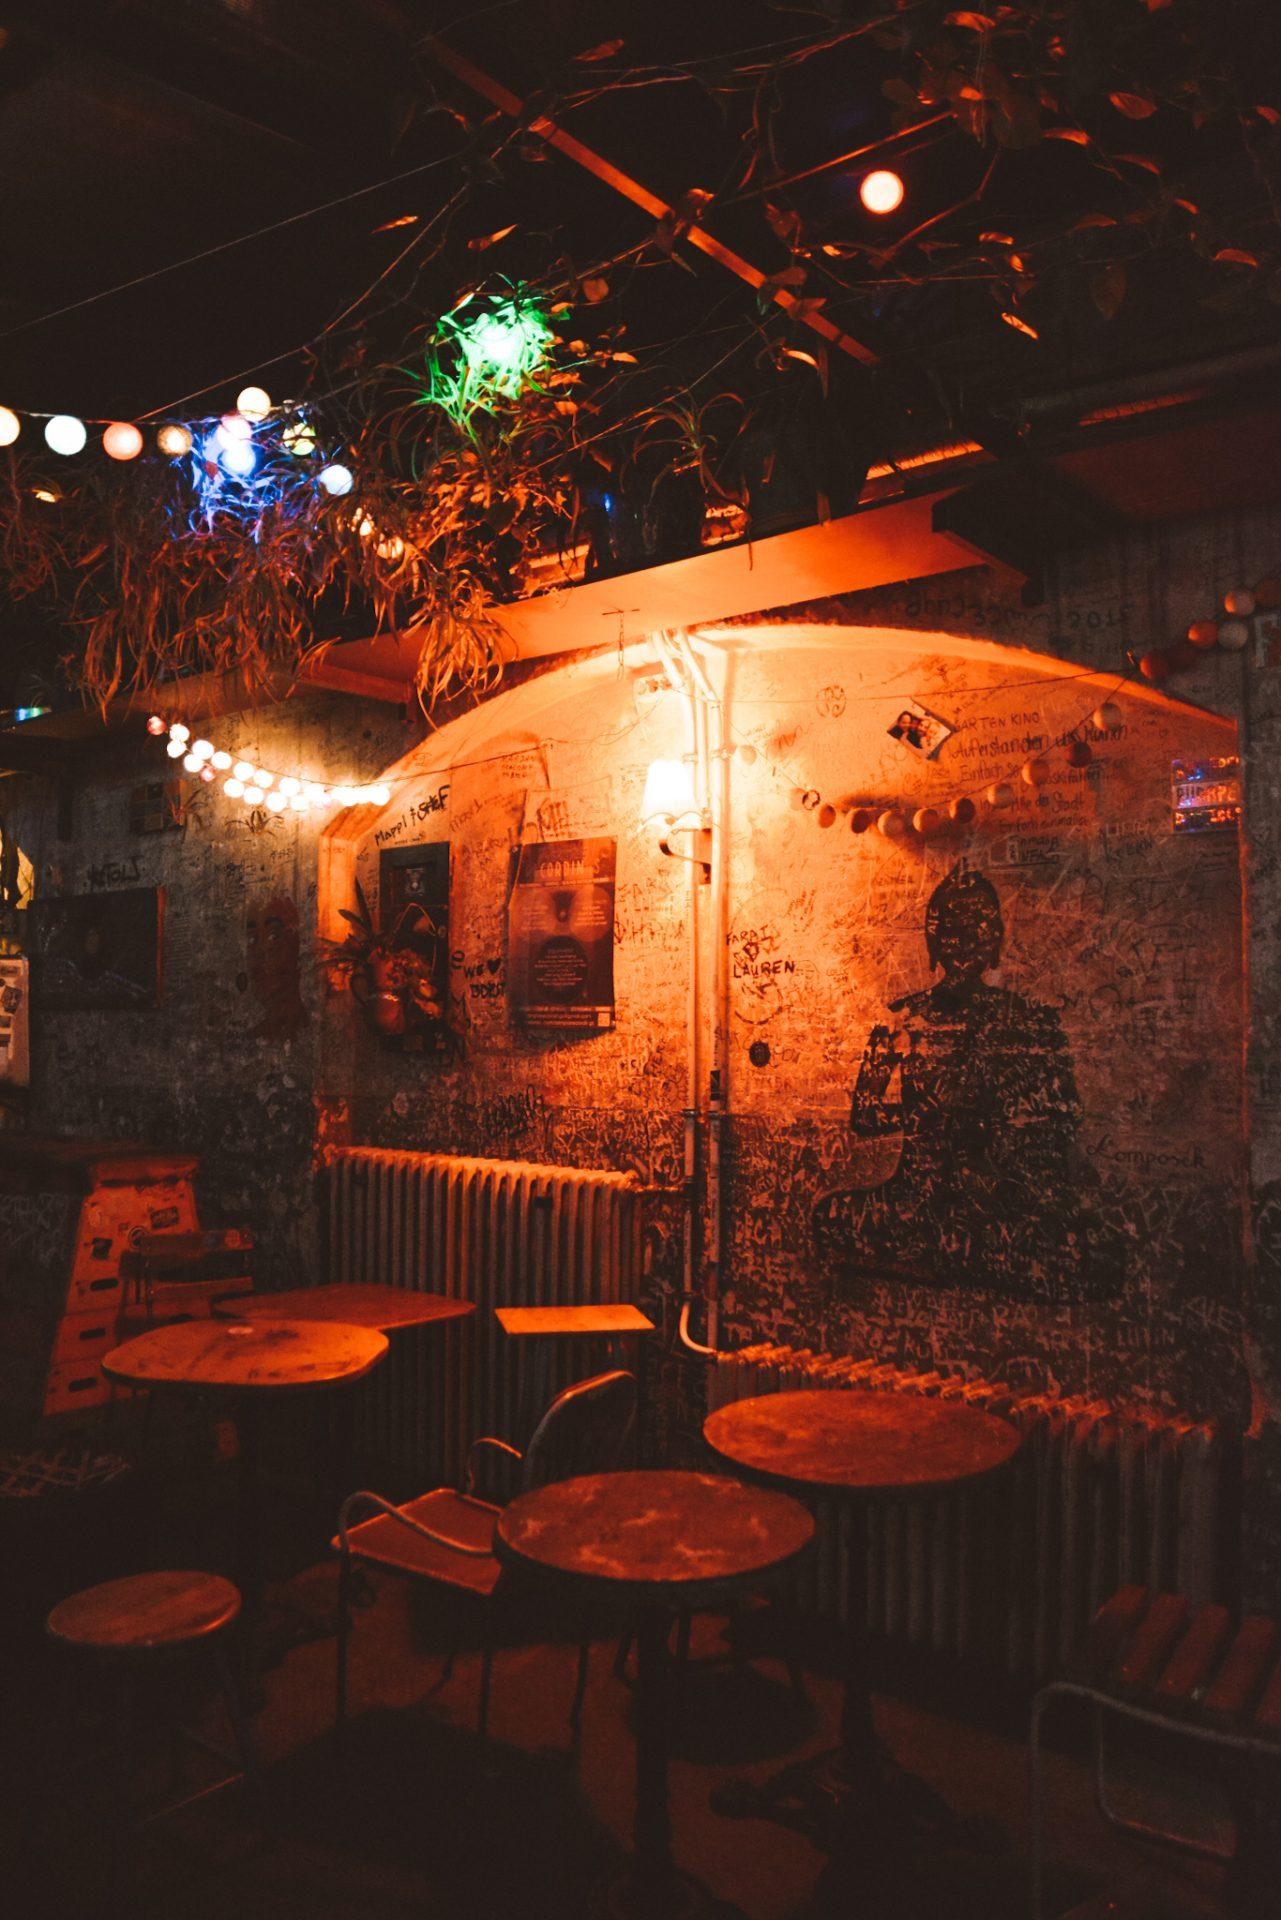 Szimpla Kert - Instagrammable Spot in Budapest